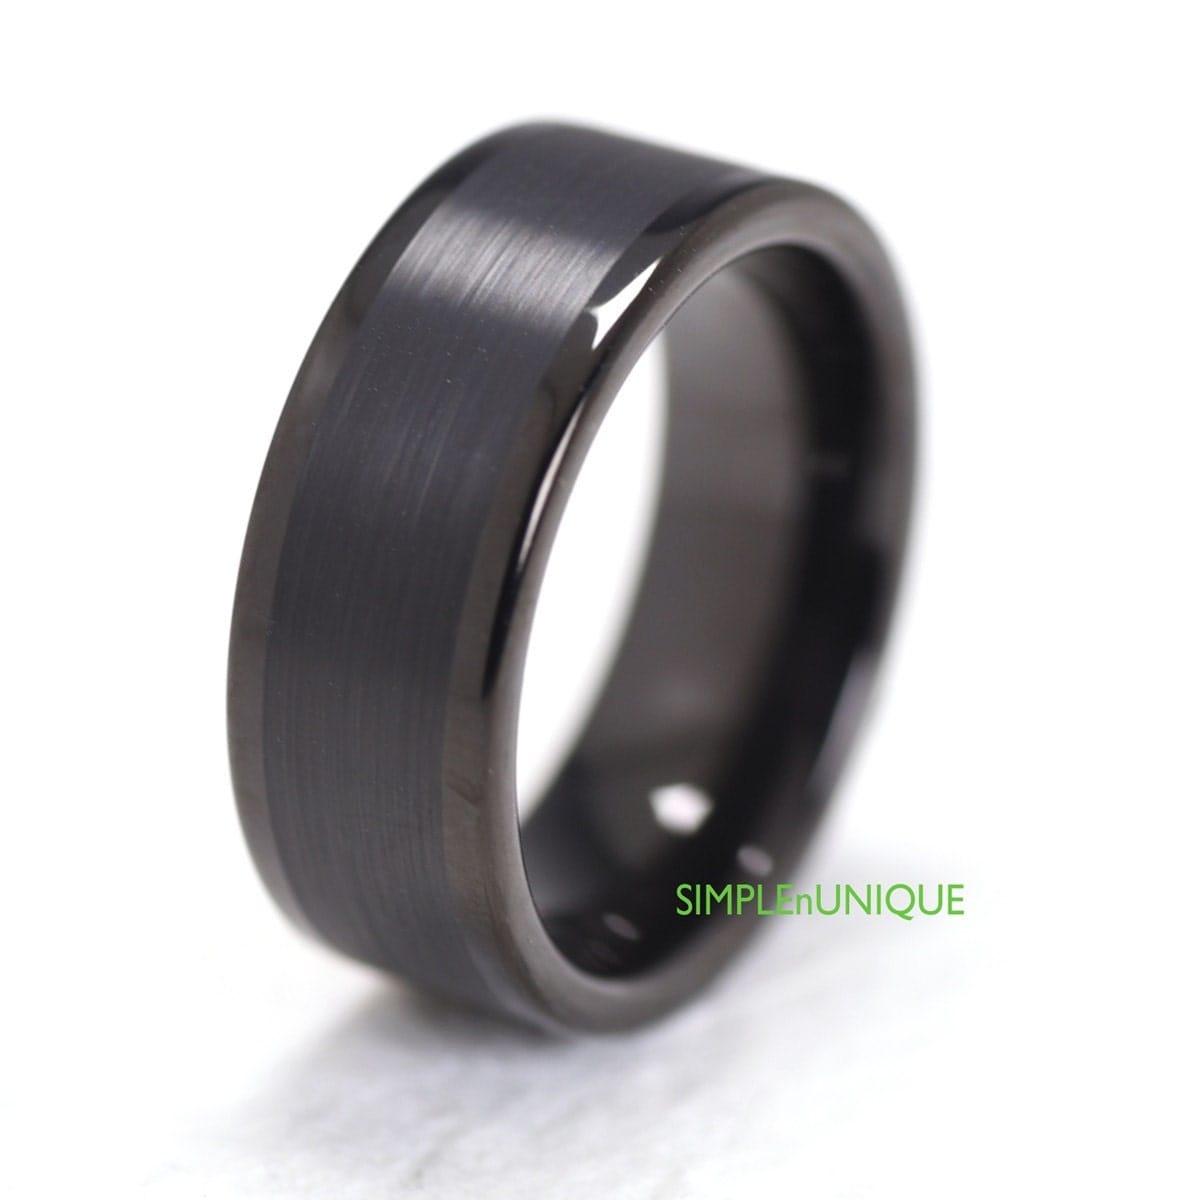 Mens Unique Bands: Mens Wedding Band Ring Unique Black Tungsten By SIMPLEnUNIQUE